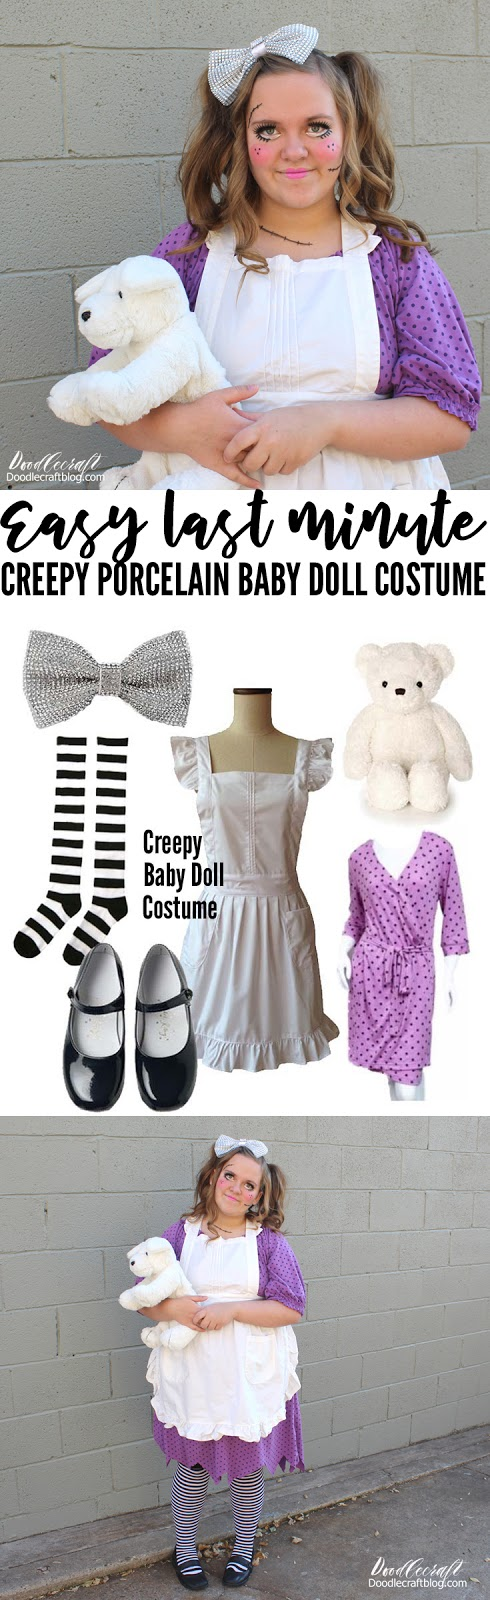 Creepy Porcelain Baby Doll Costume Diy